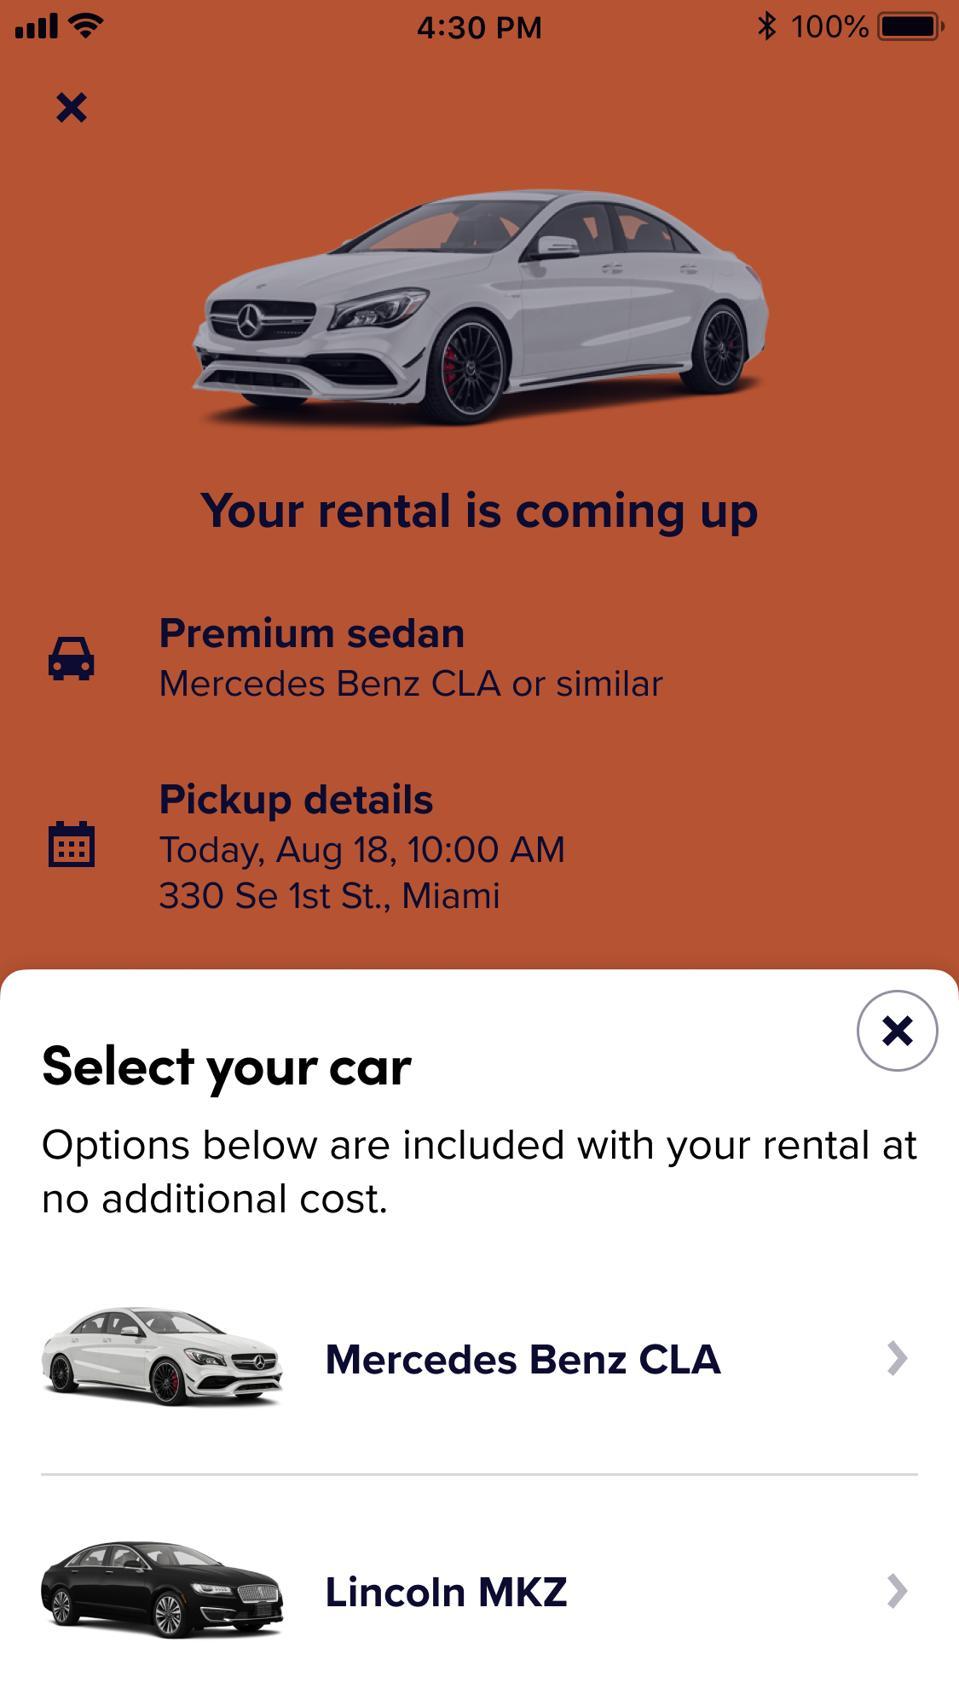 Smartphone screen showing car rental information.